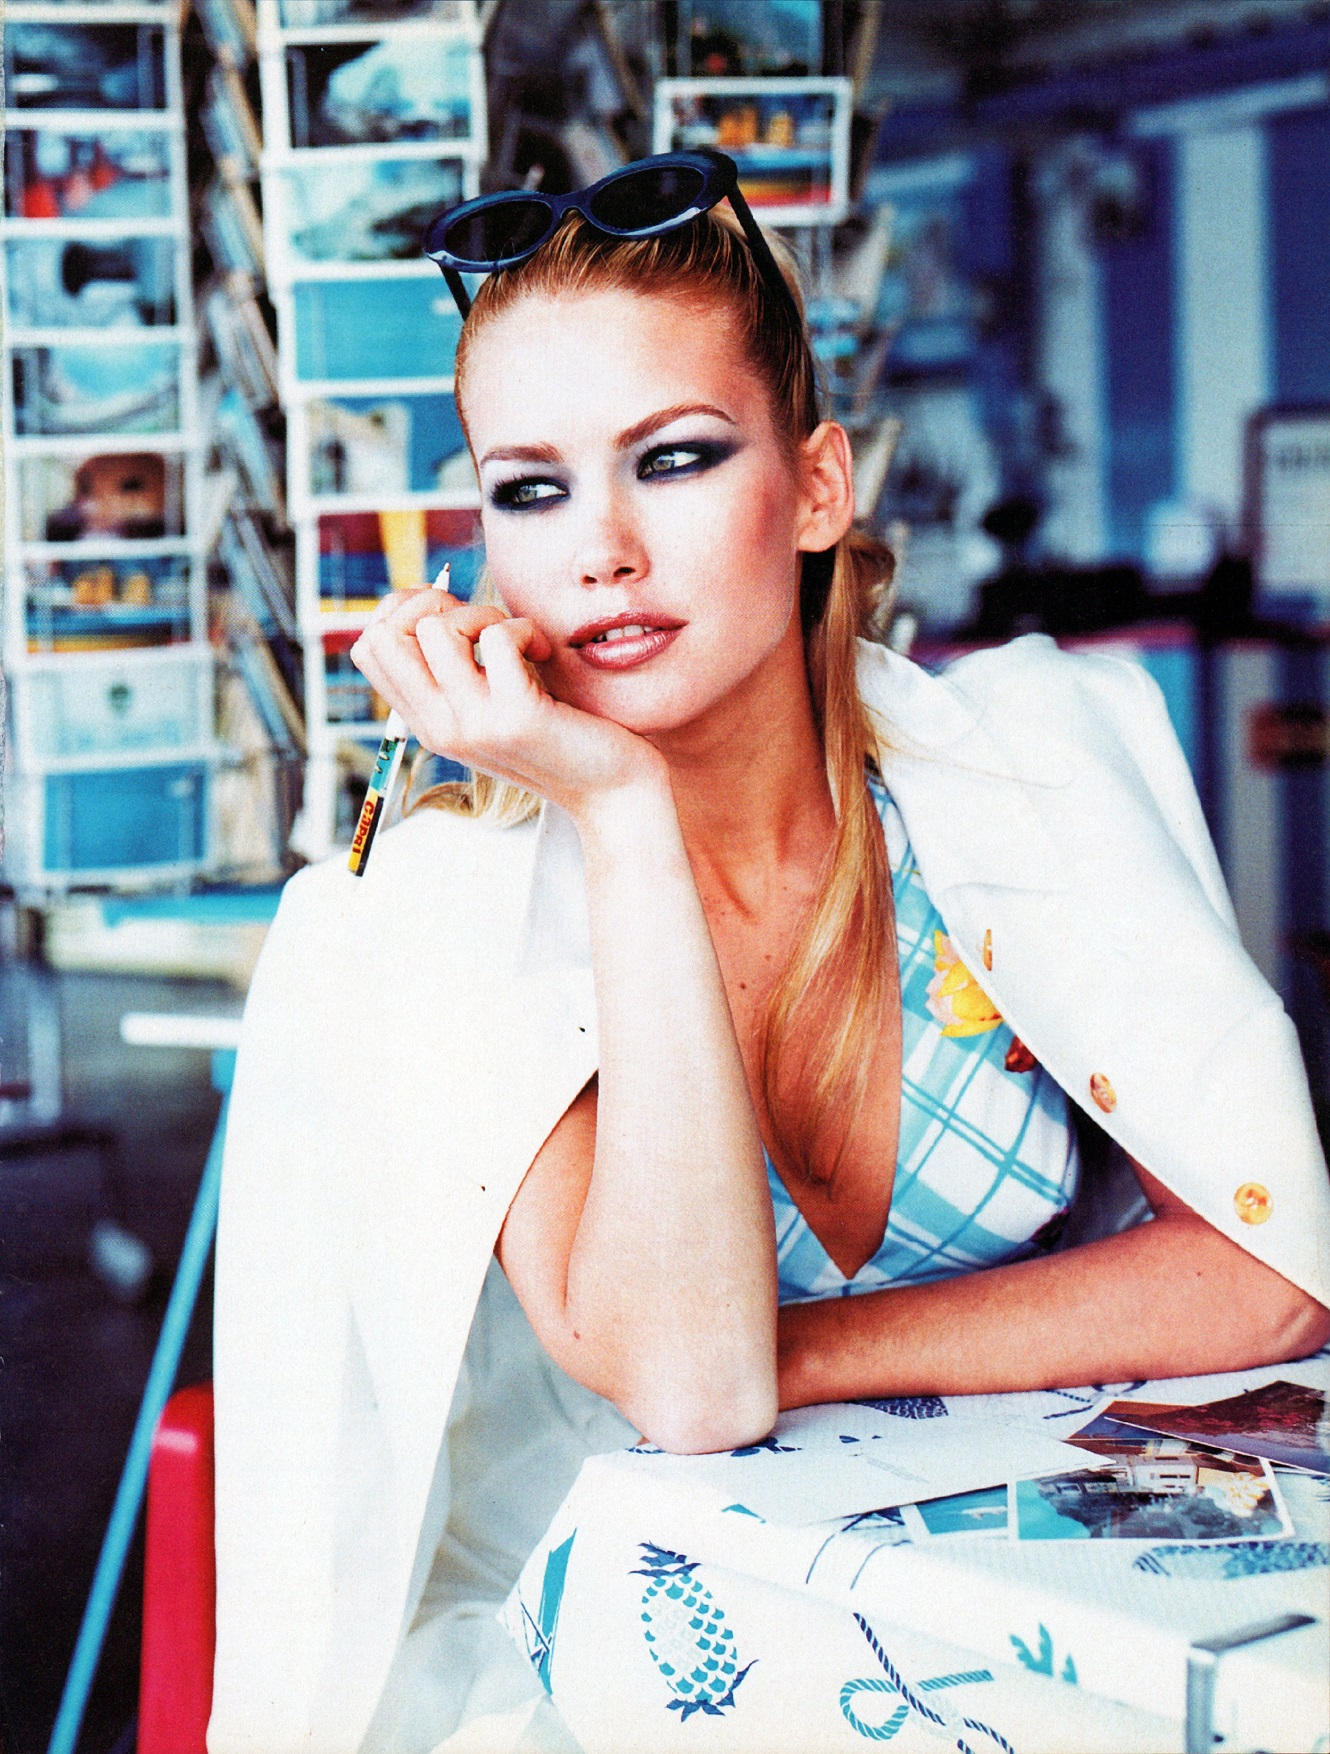 foto Valeria Mazza ARG 1 1998